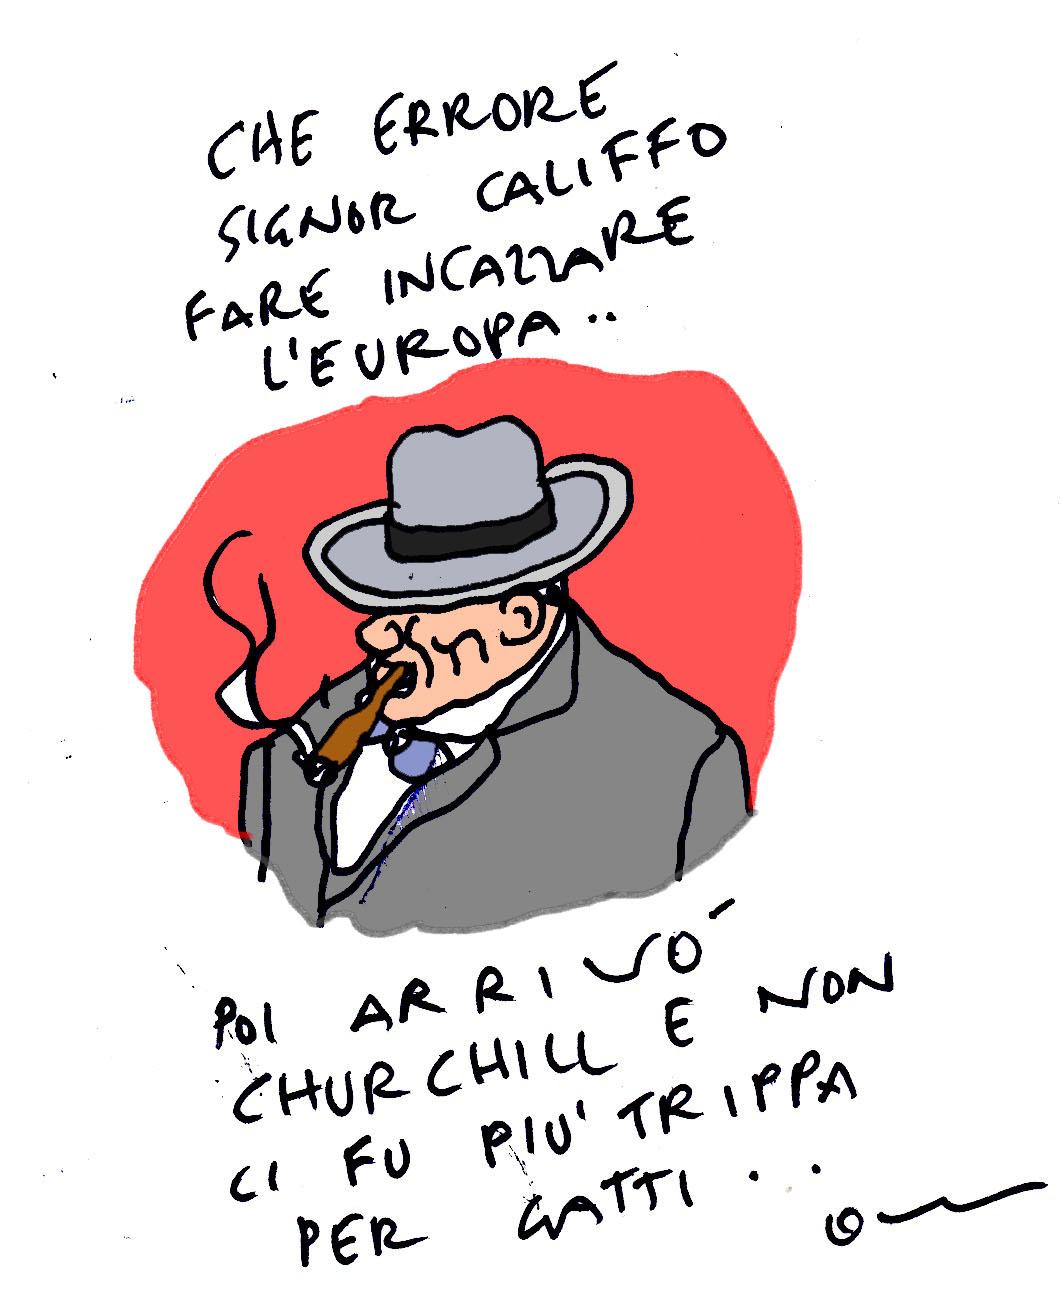 churc2hikll